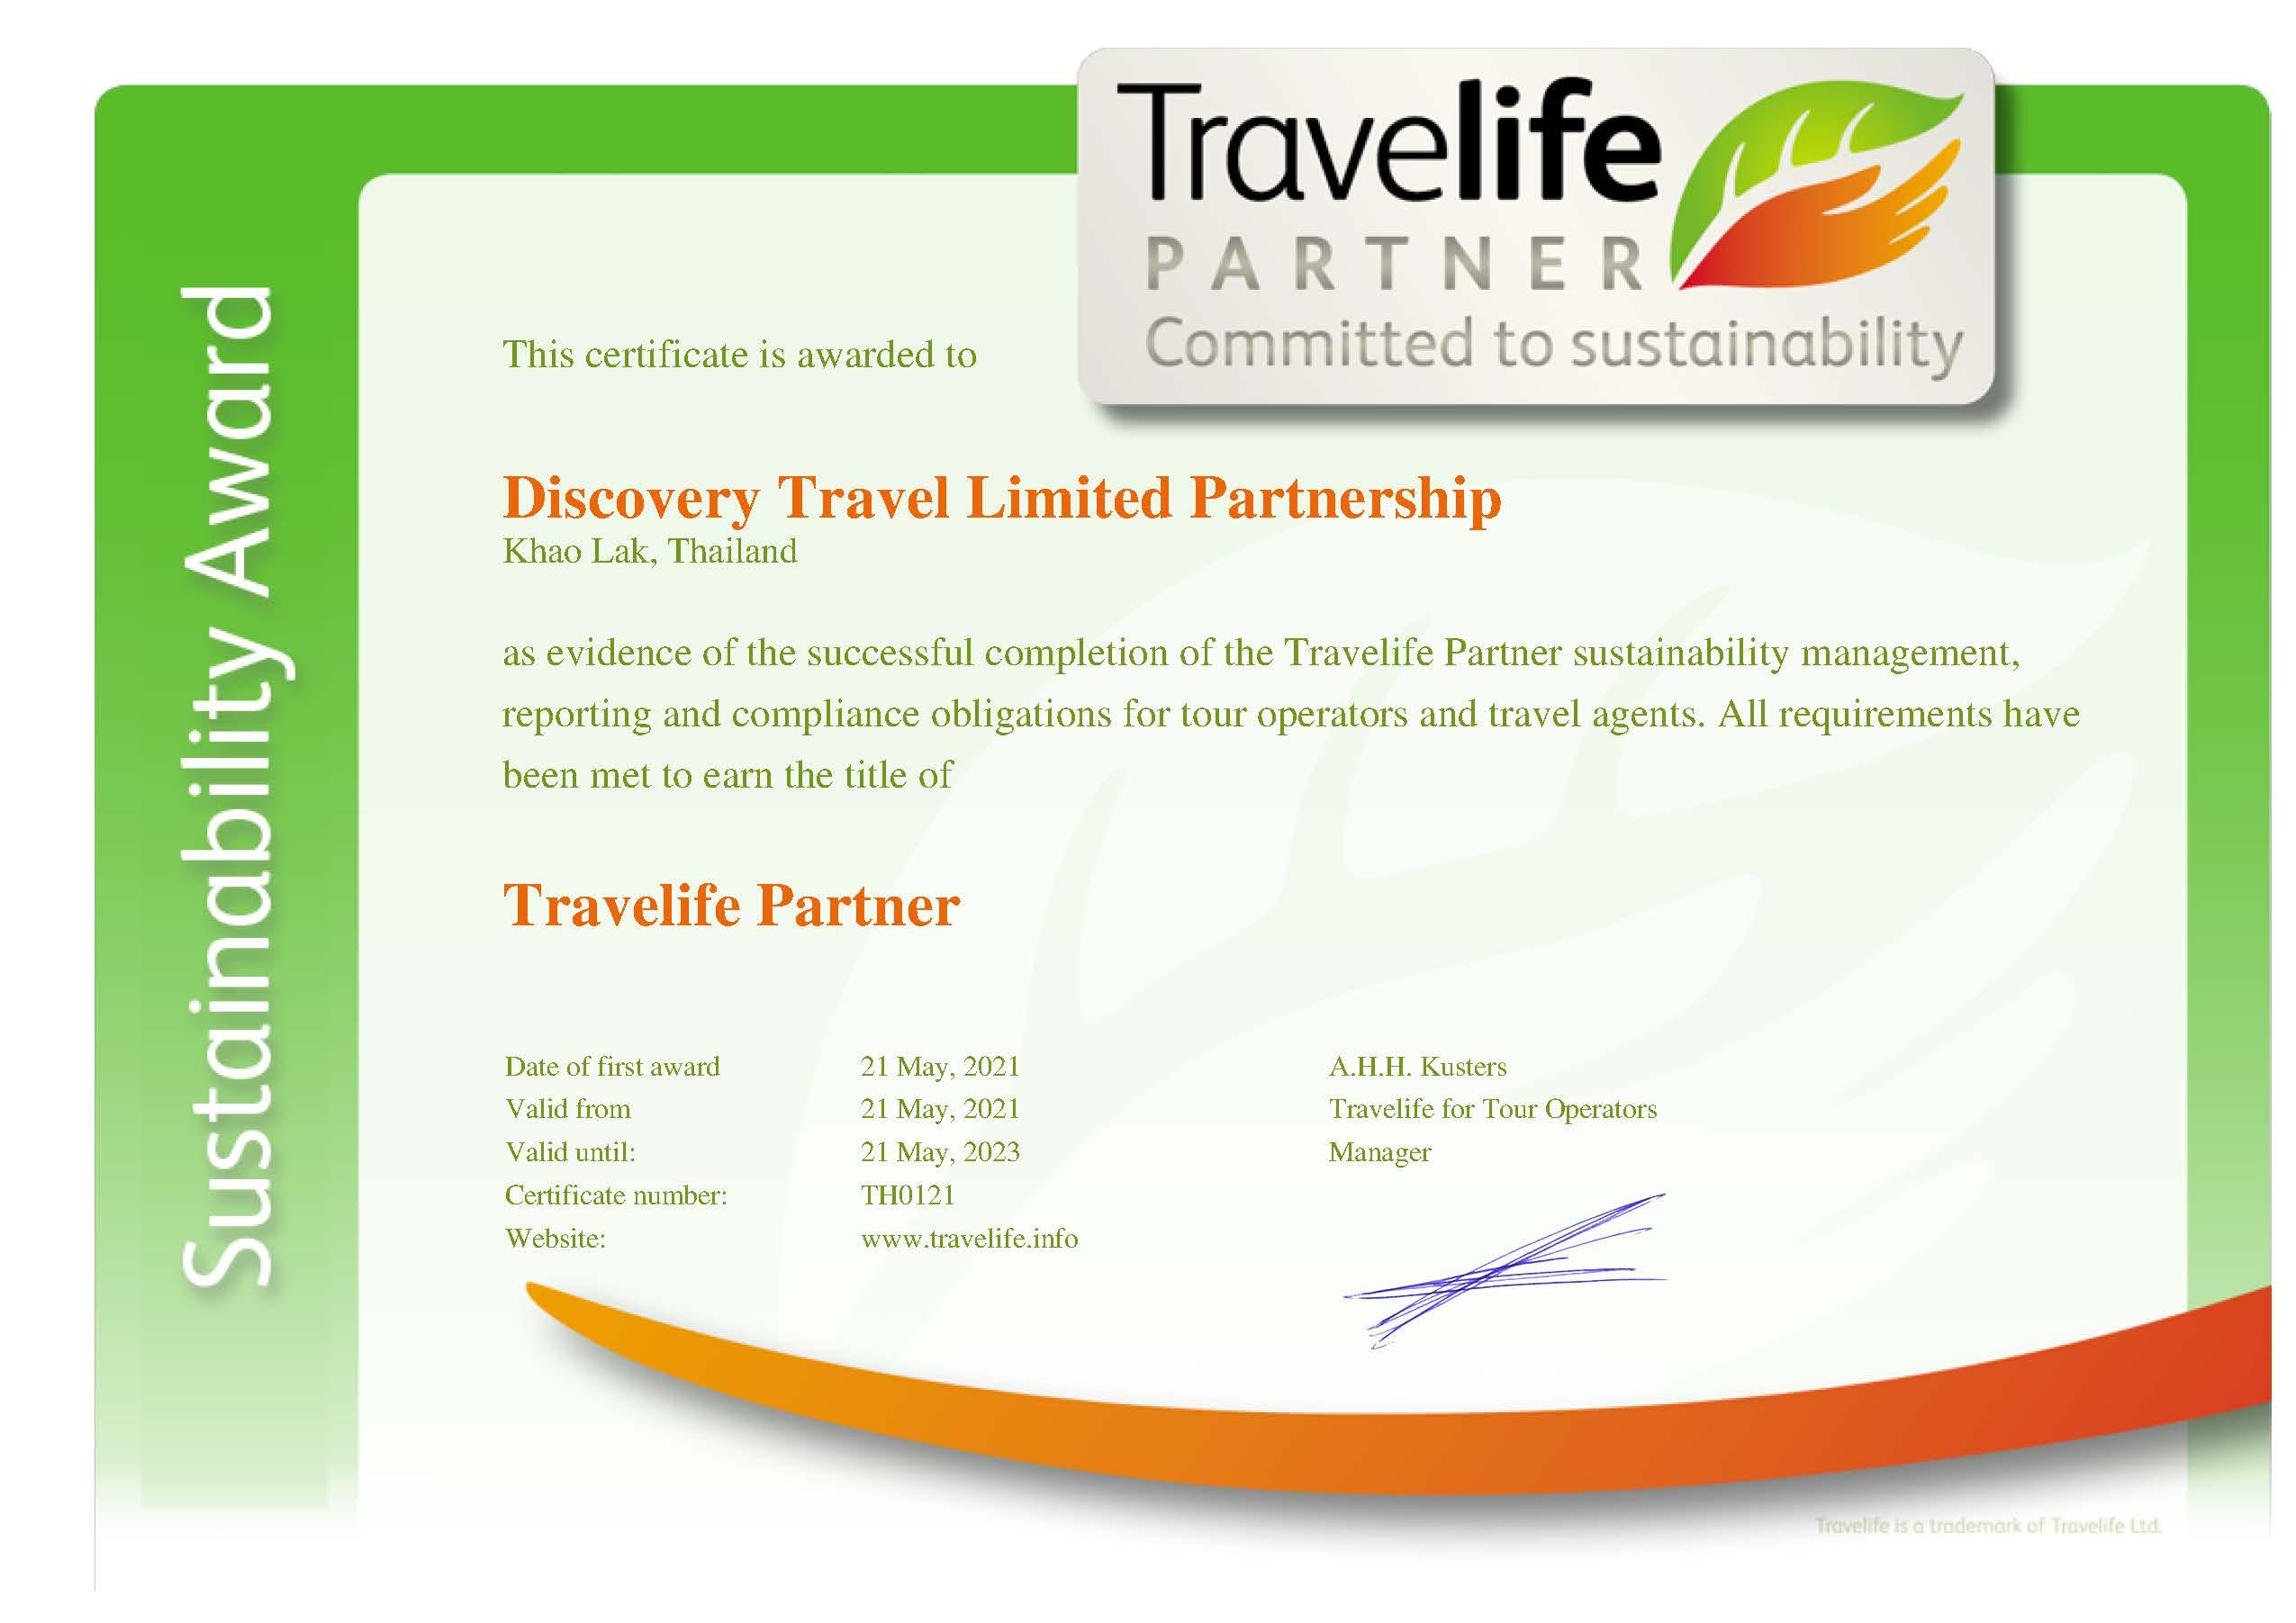 Travelife Partner Certification